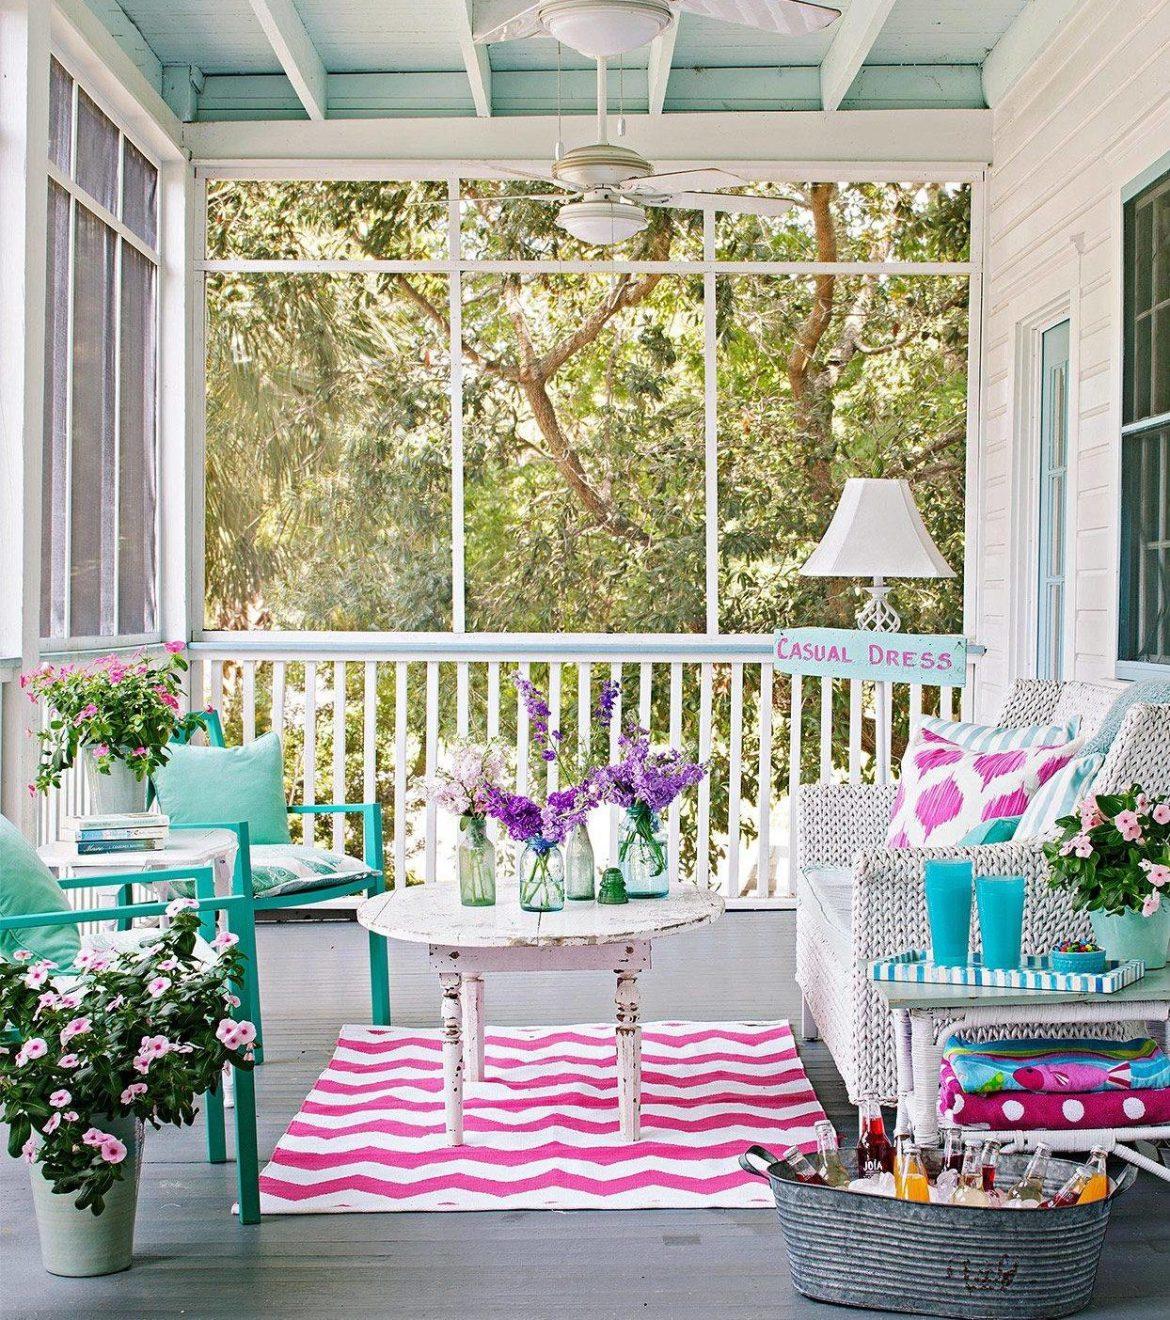 Modern Country Rustic Chic Porch Tiffany Blue Teal Aquamarine Sunroom Pink Chevron Area Rug